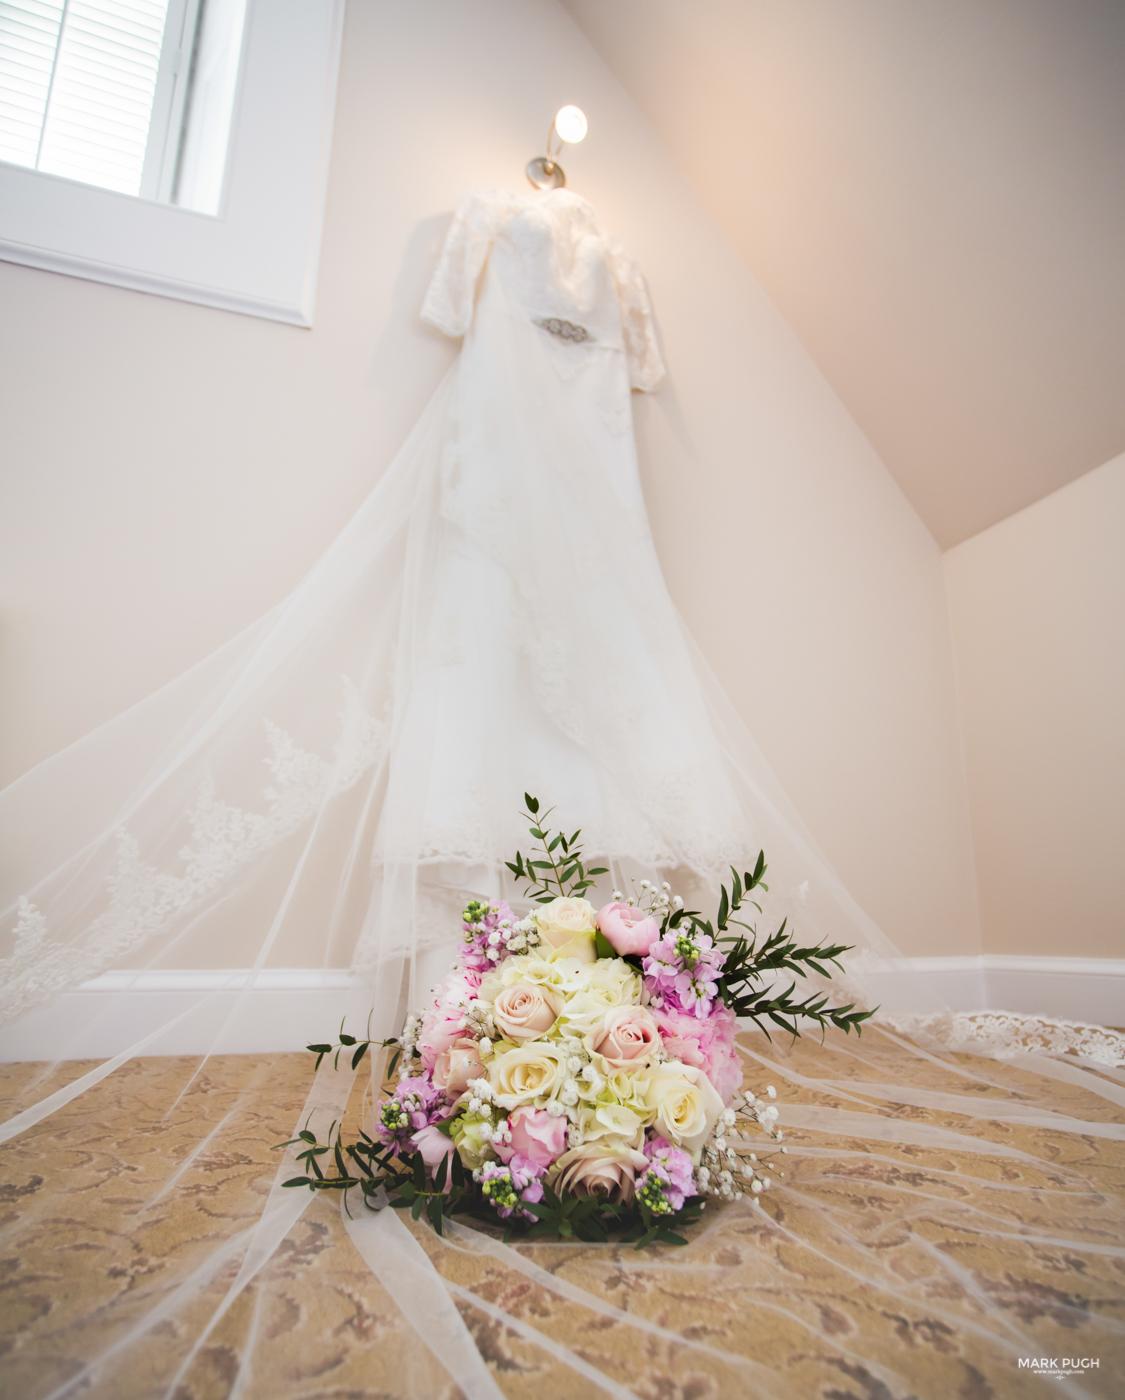 084 Wedding Photography Award winning Wedding Photographer and Videographer Mark Pugh www.markpugh.com.JPG